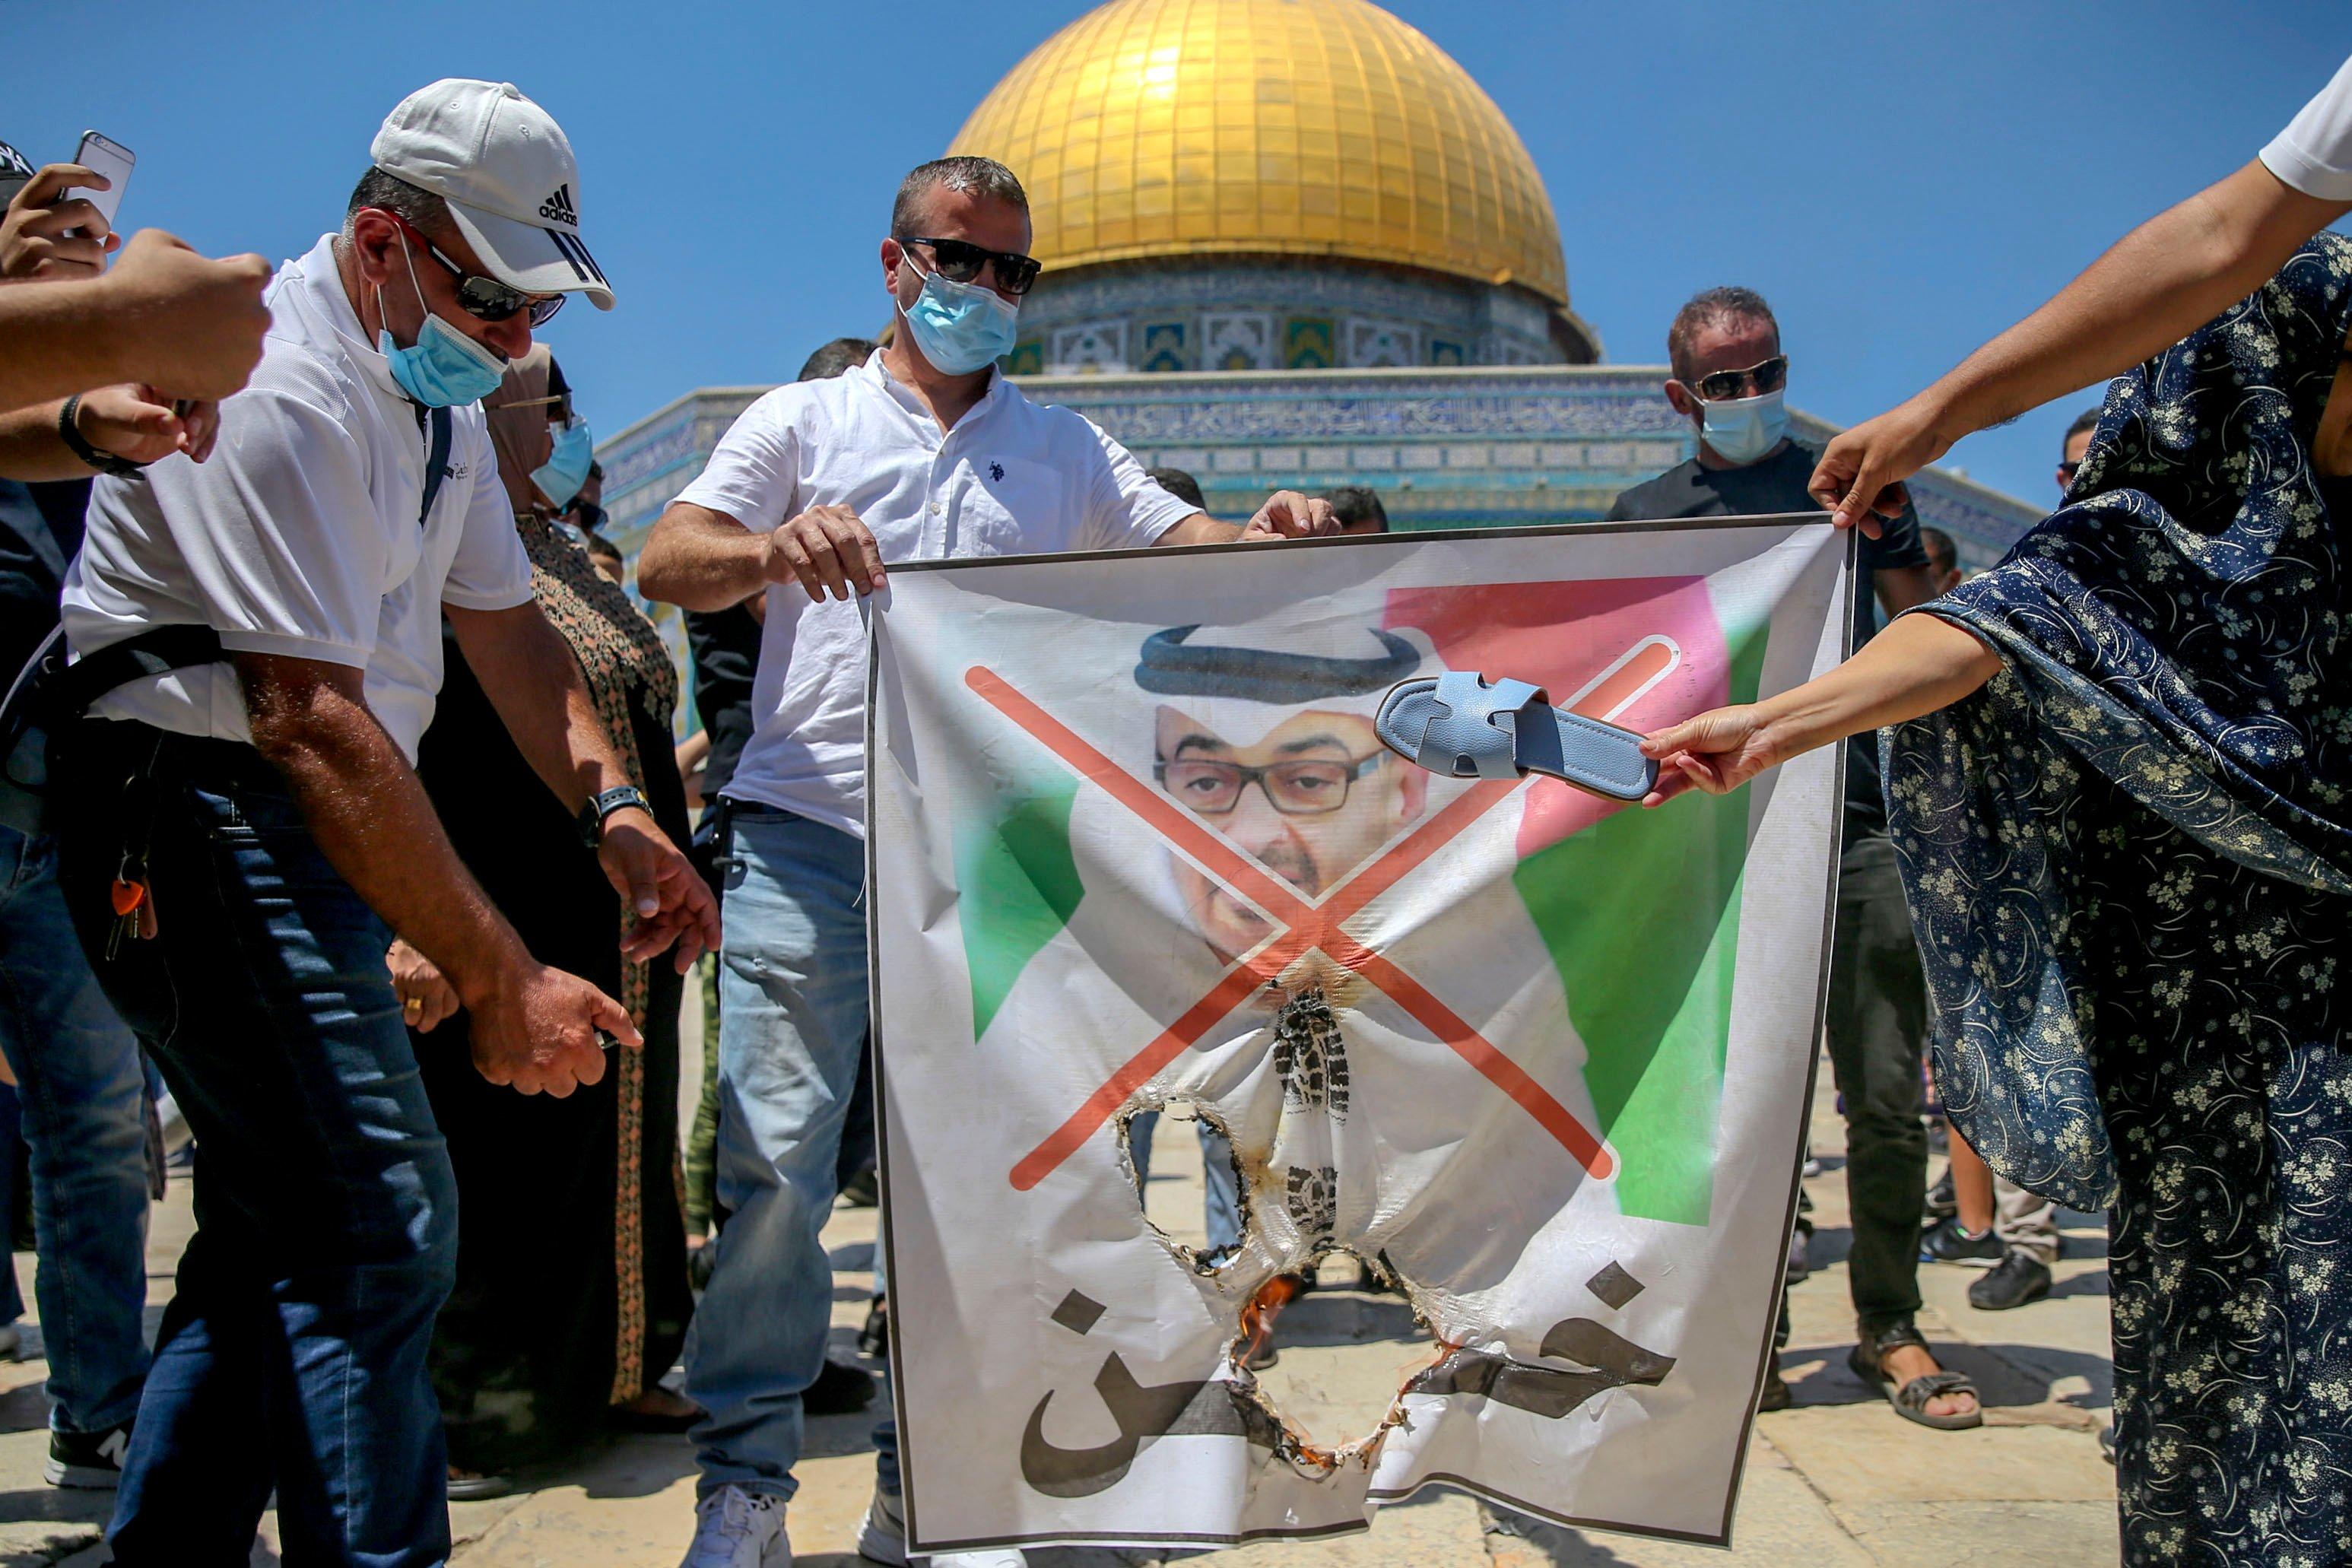 Israel-UAE deal raises concerns over change in status of Al-Aqsa: Report